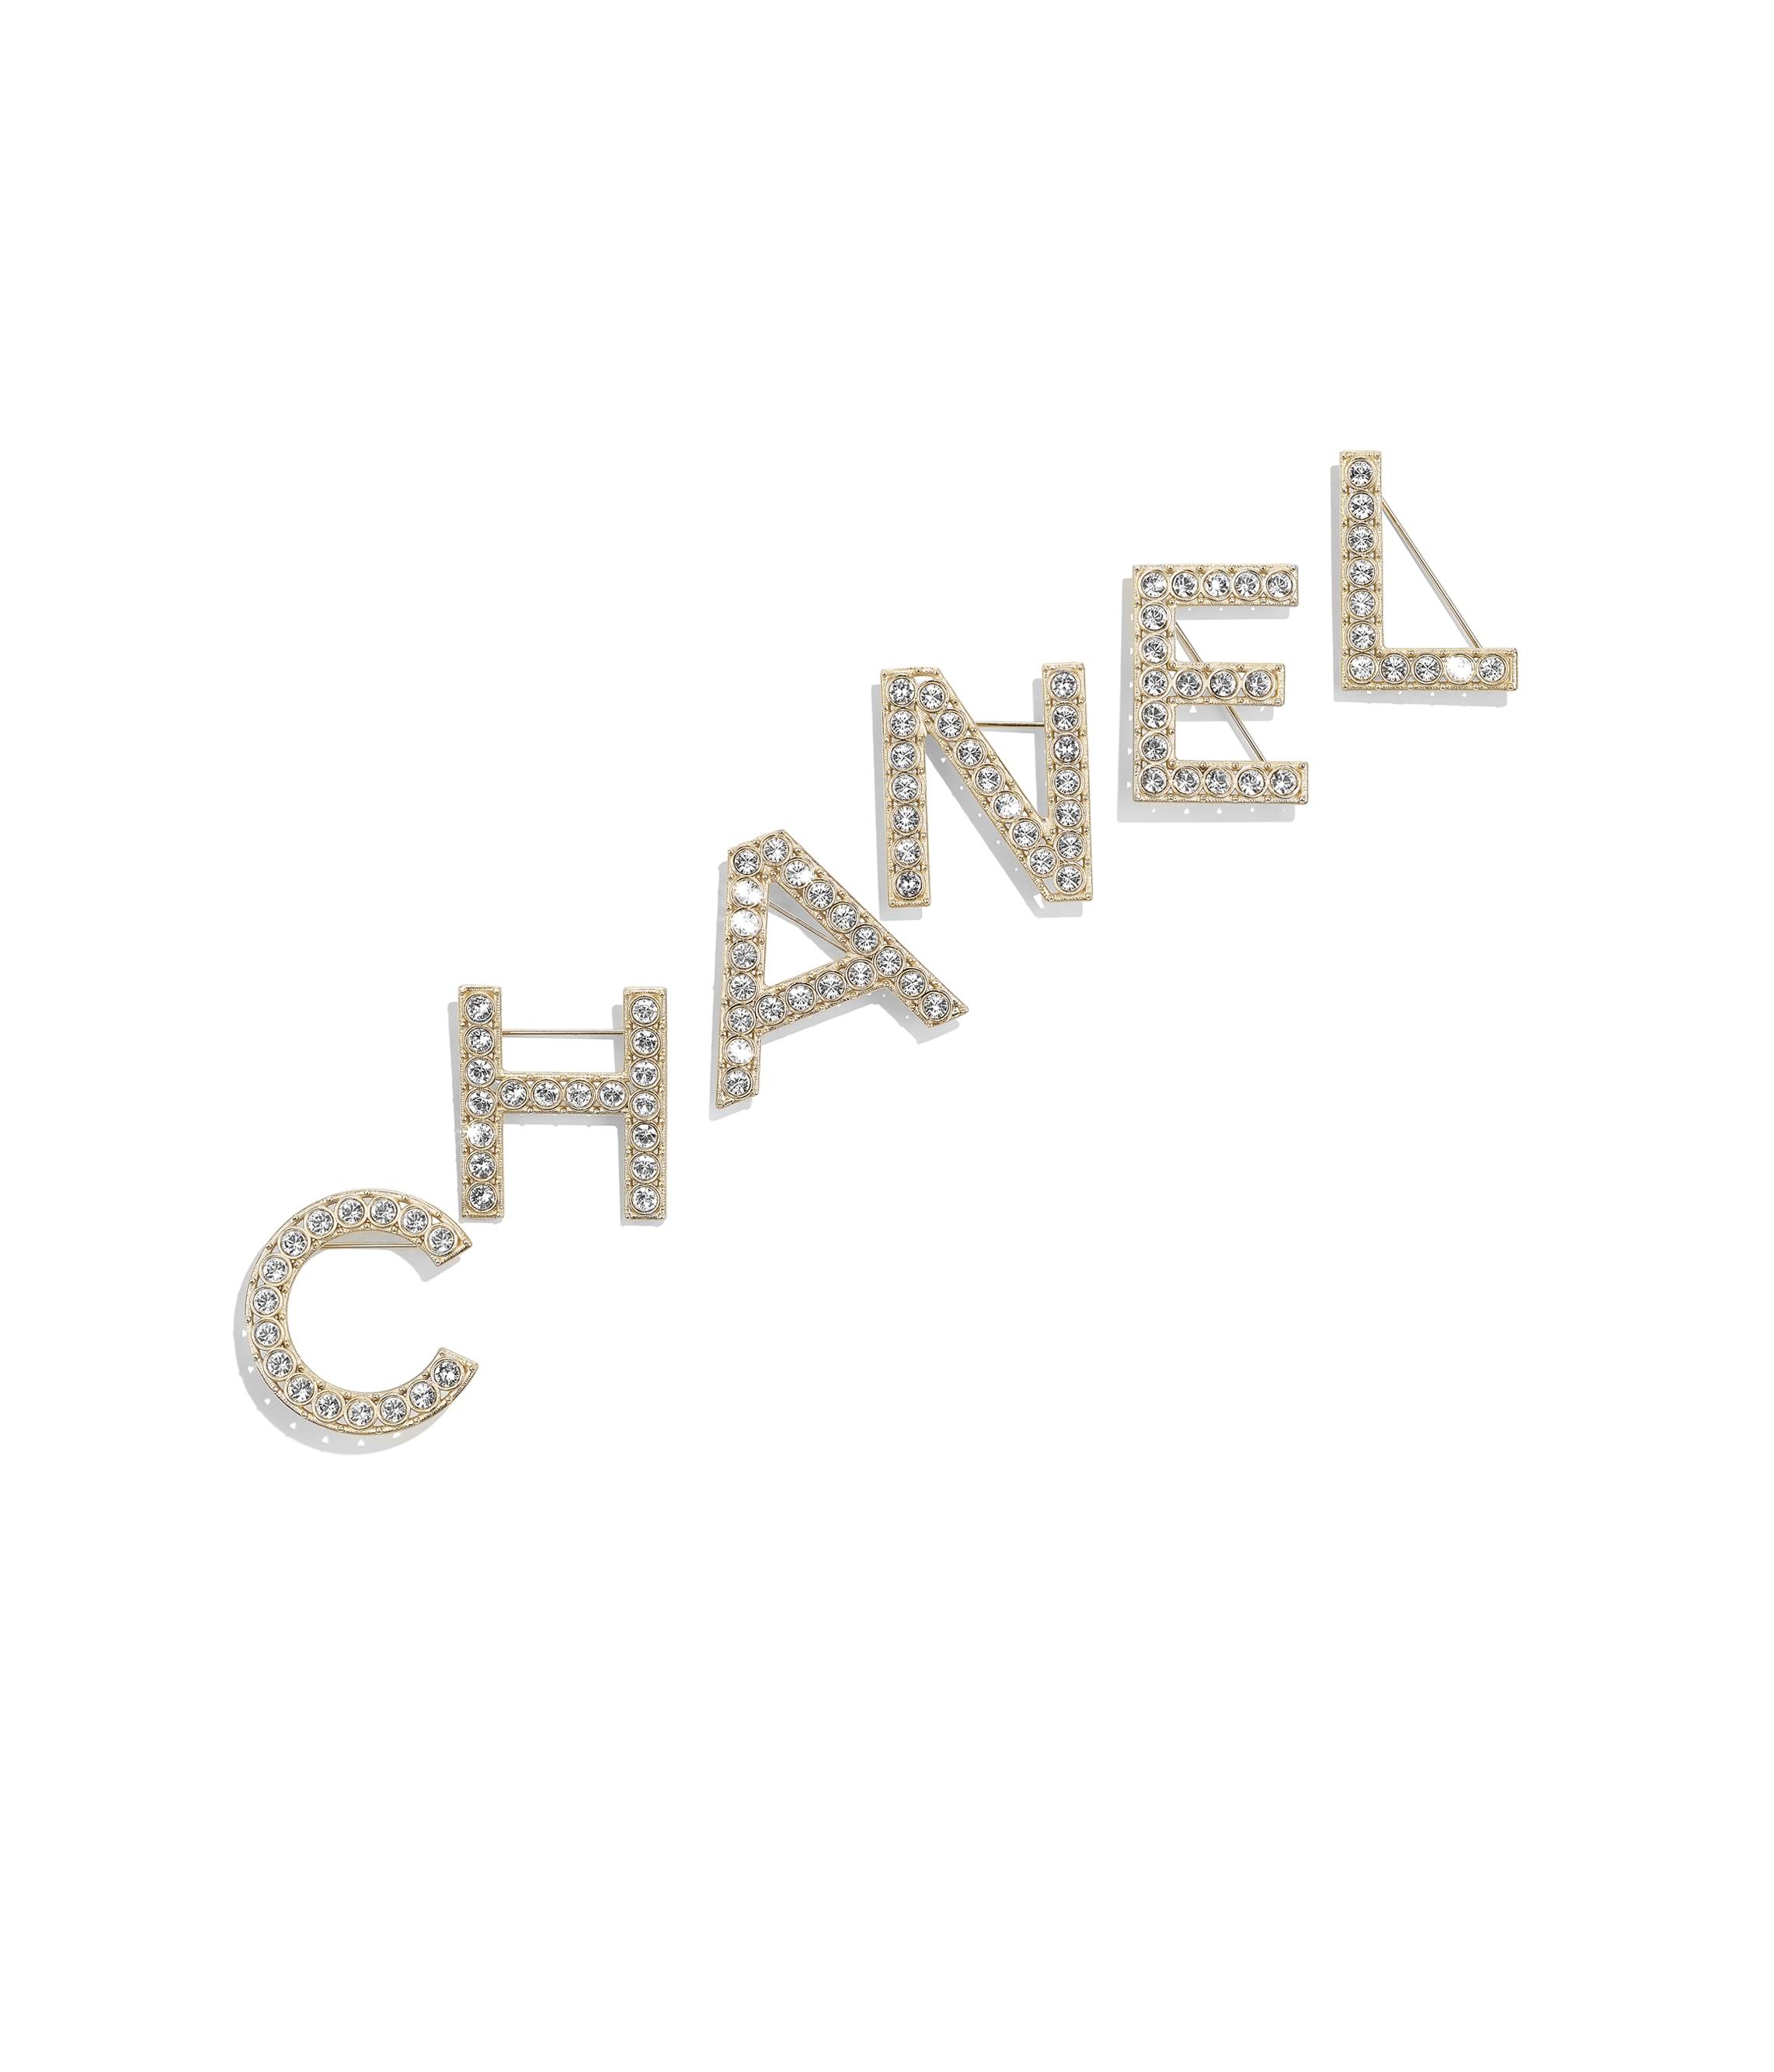 50c1d773ad3 Broches - Bijoux - CHANEL